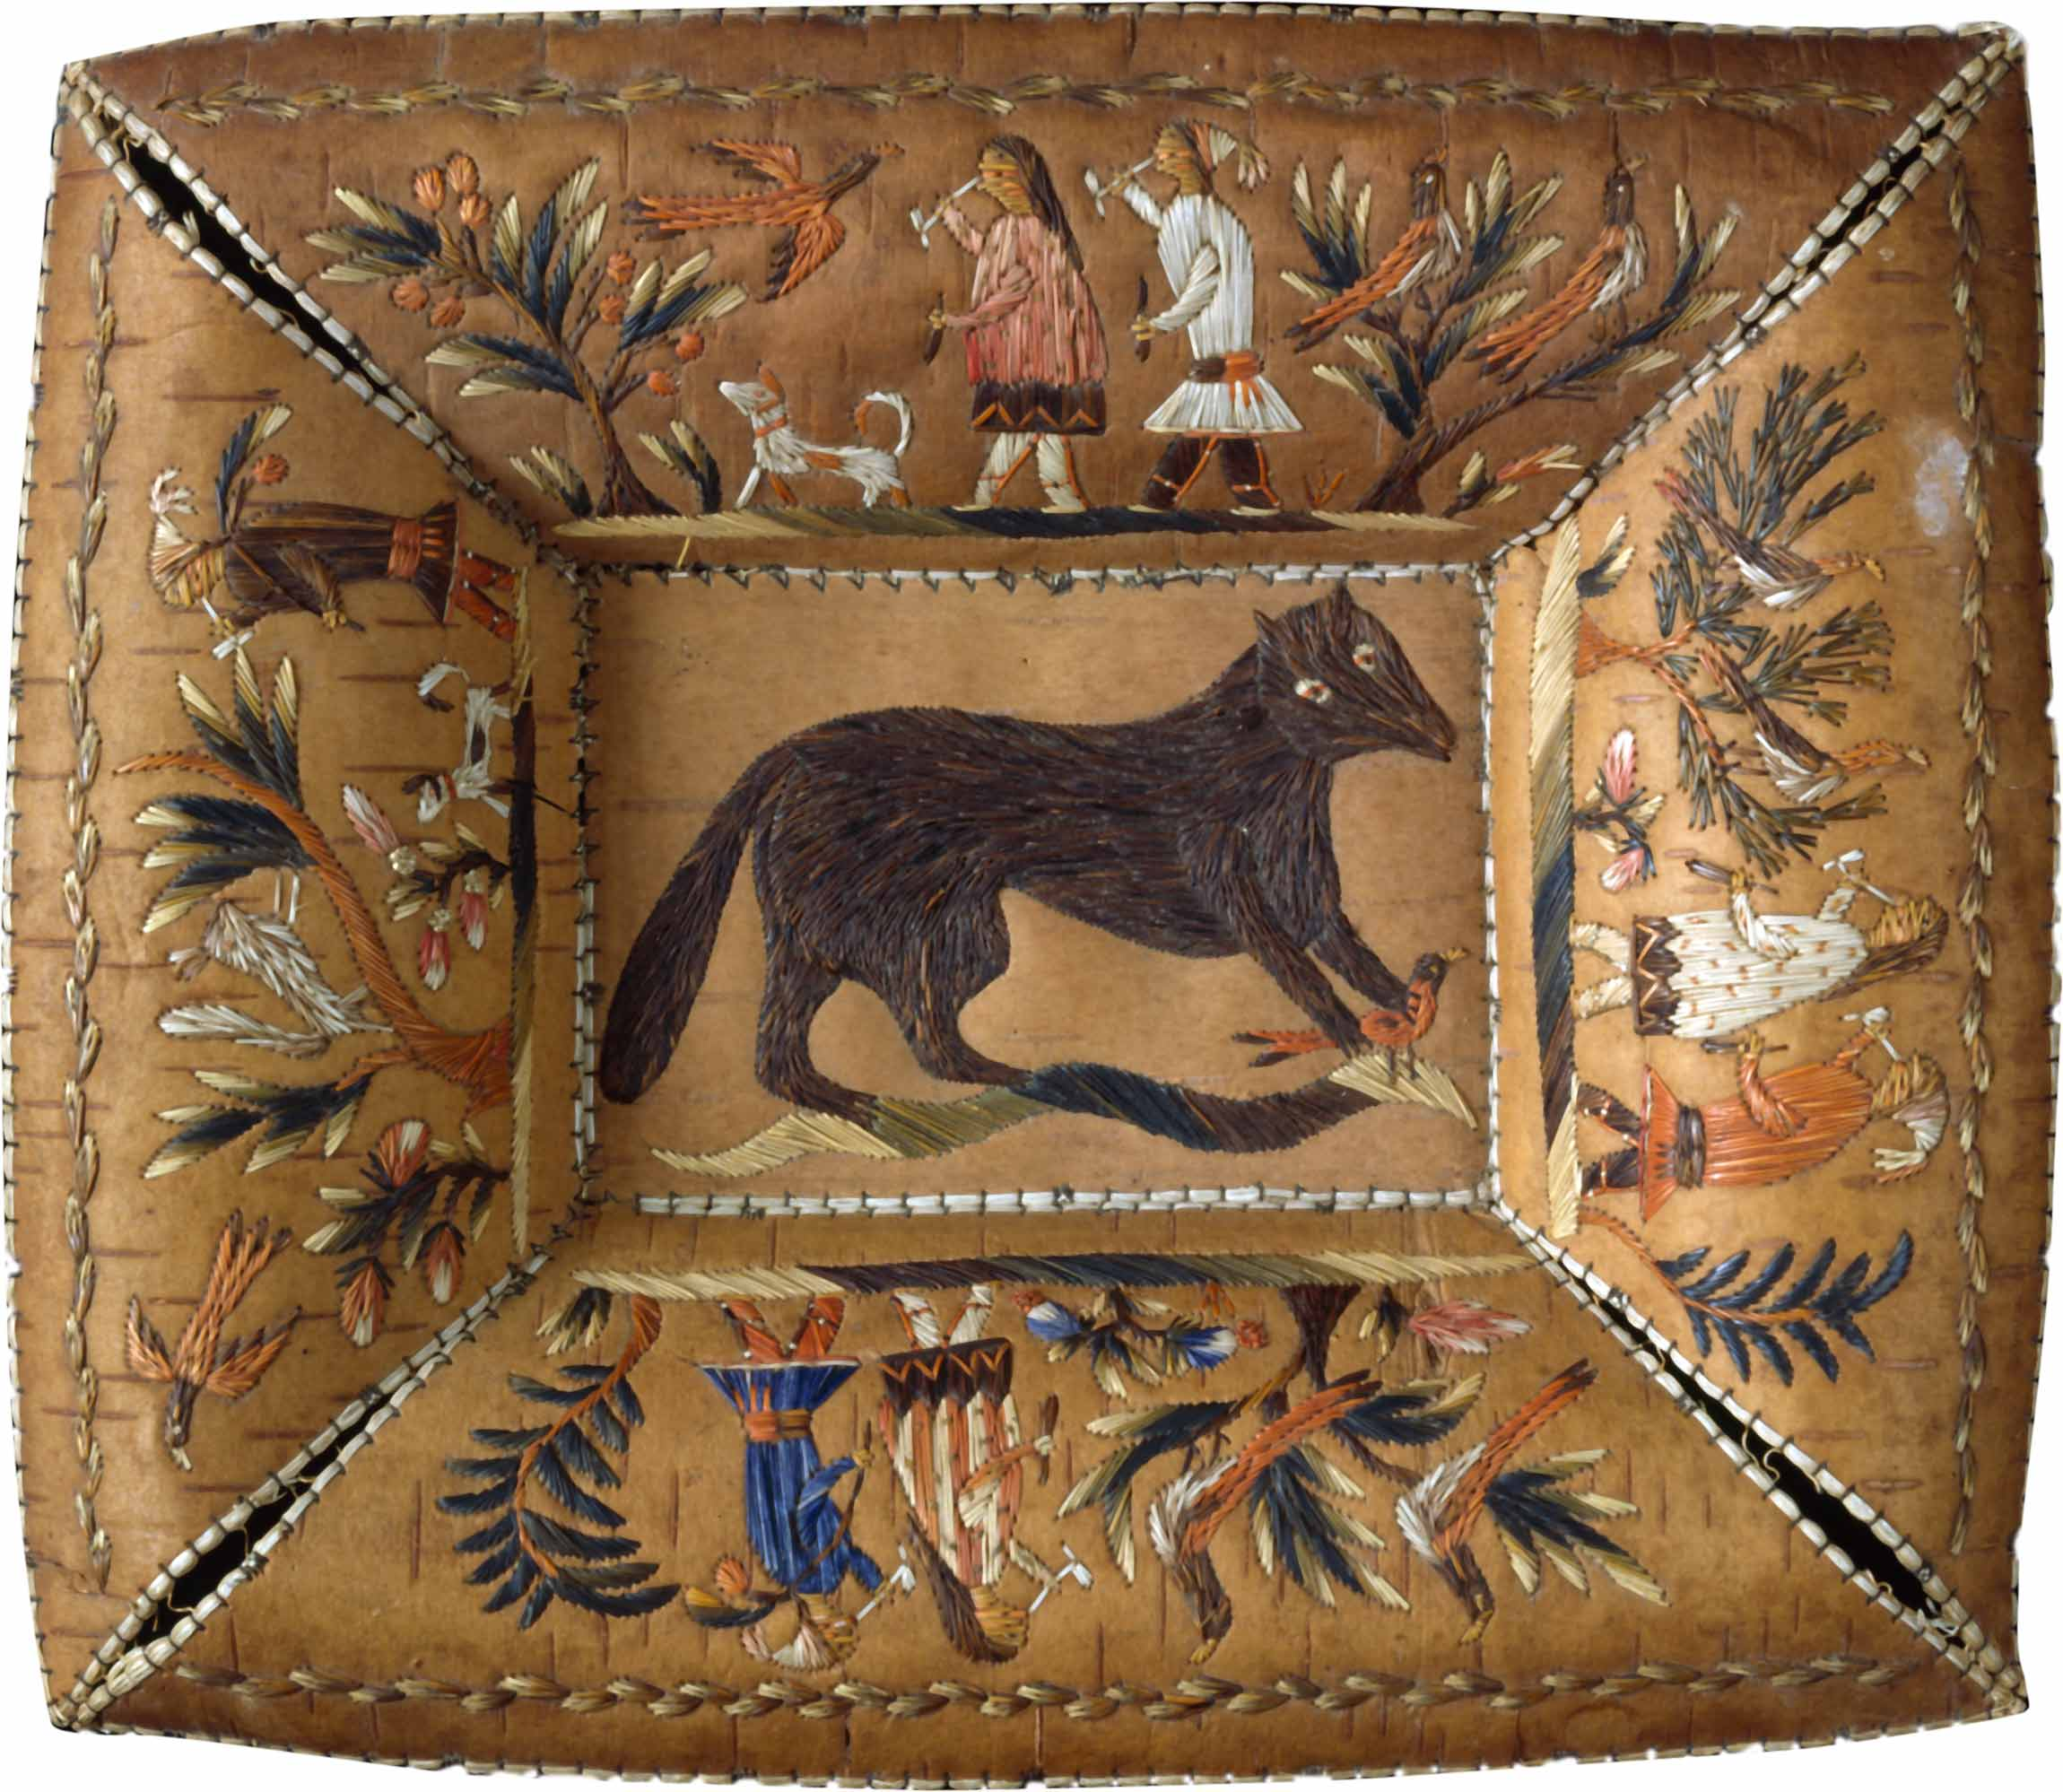 pem org native american art